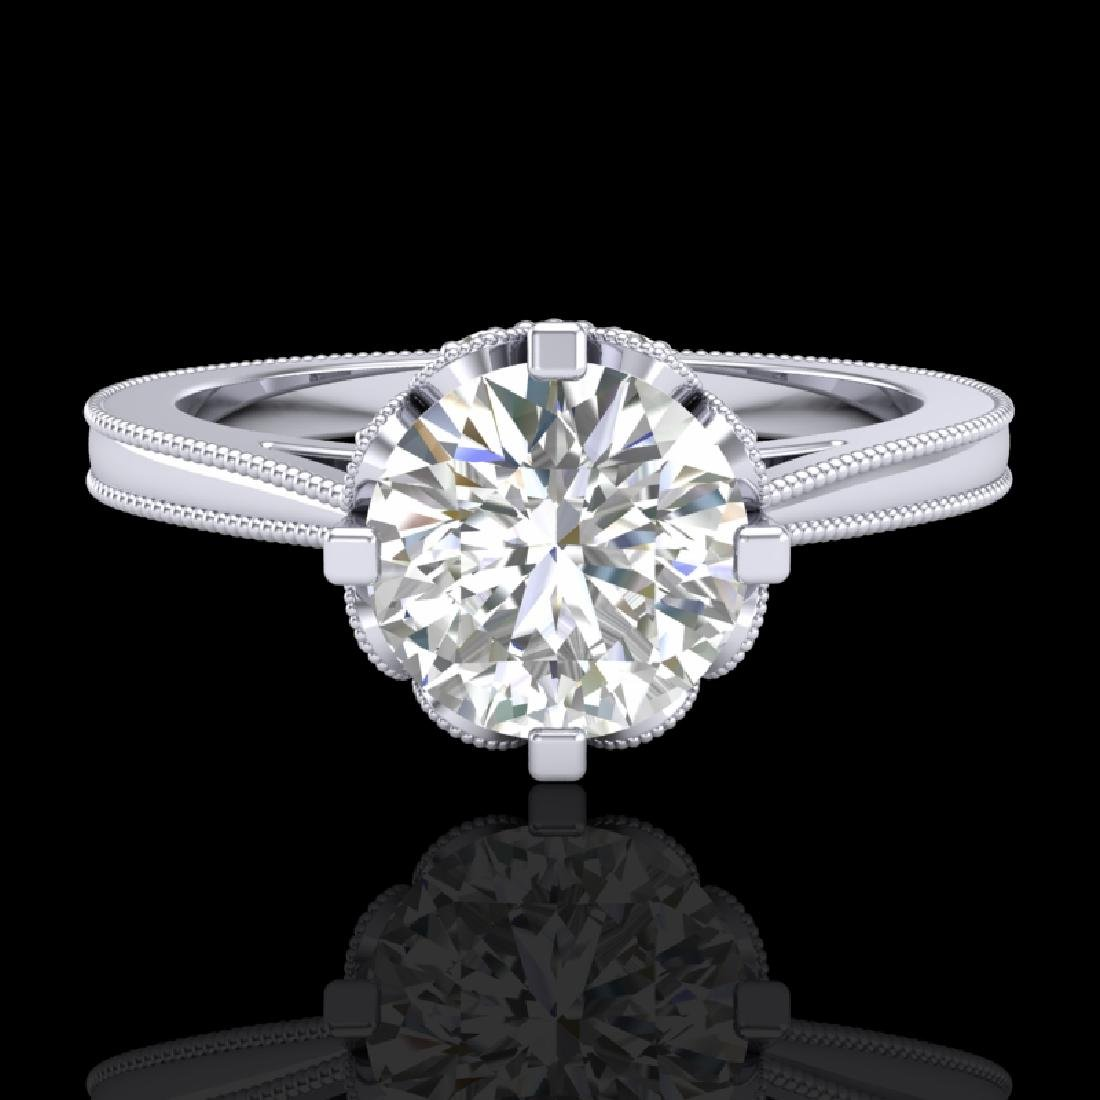 1.5 CTW VS/SI Diamond Art Deco Ring 18K White Gold - 2